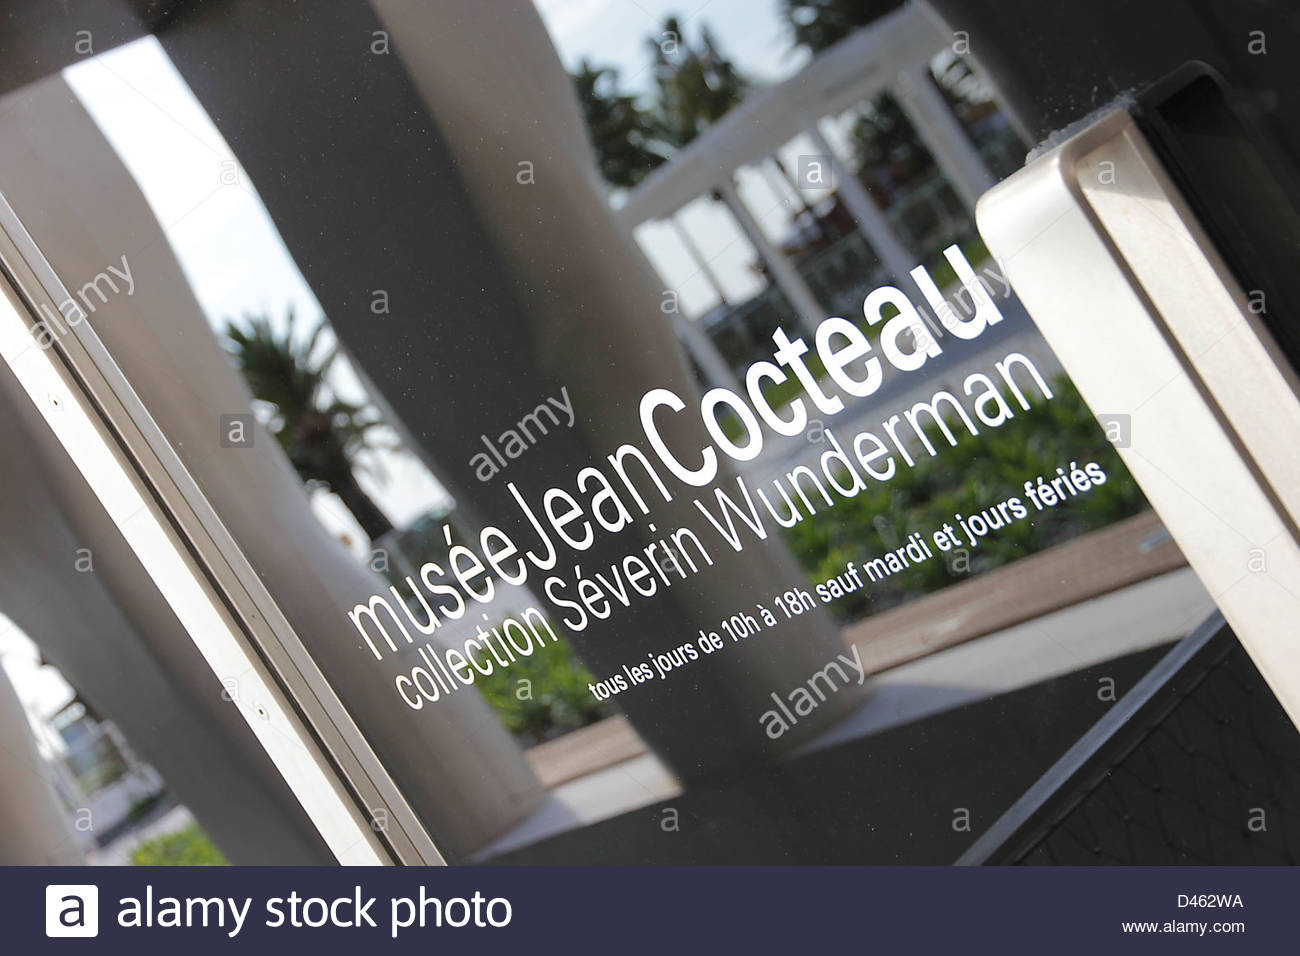 Jean Cocteau Museum, Menton, Alpes-Maritimes, PACA, France, Europe - Stock Image